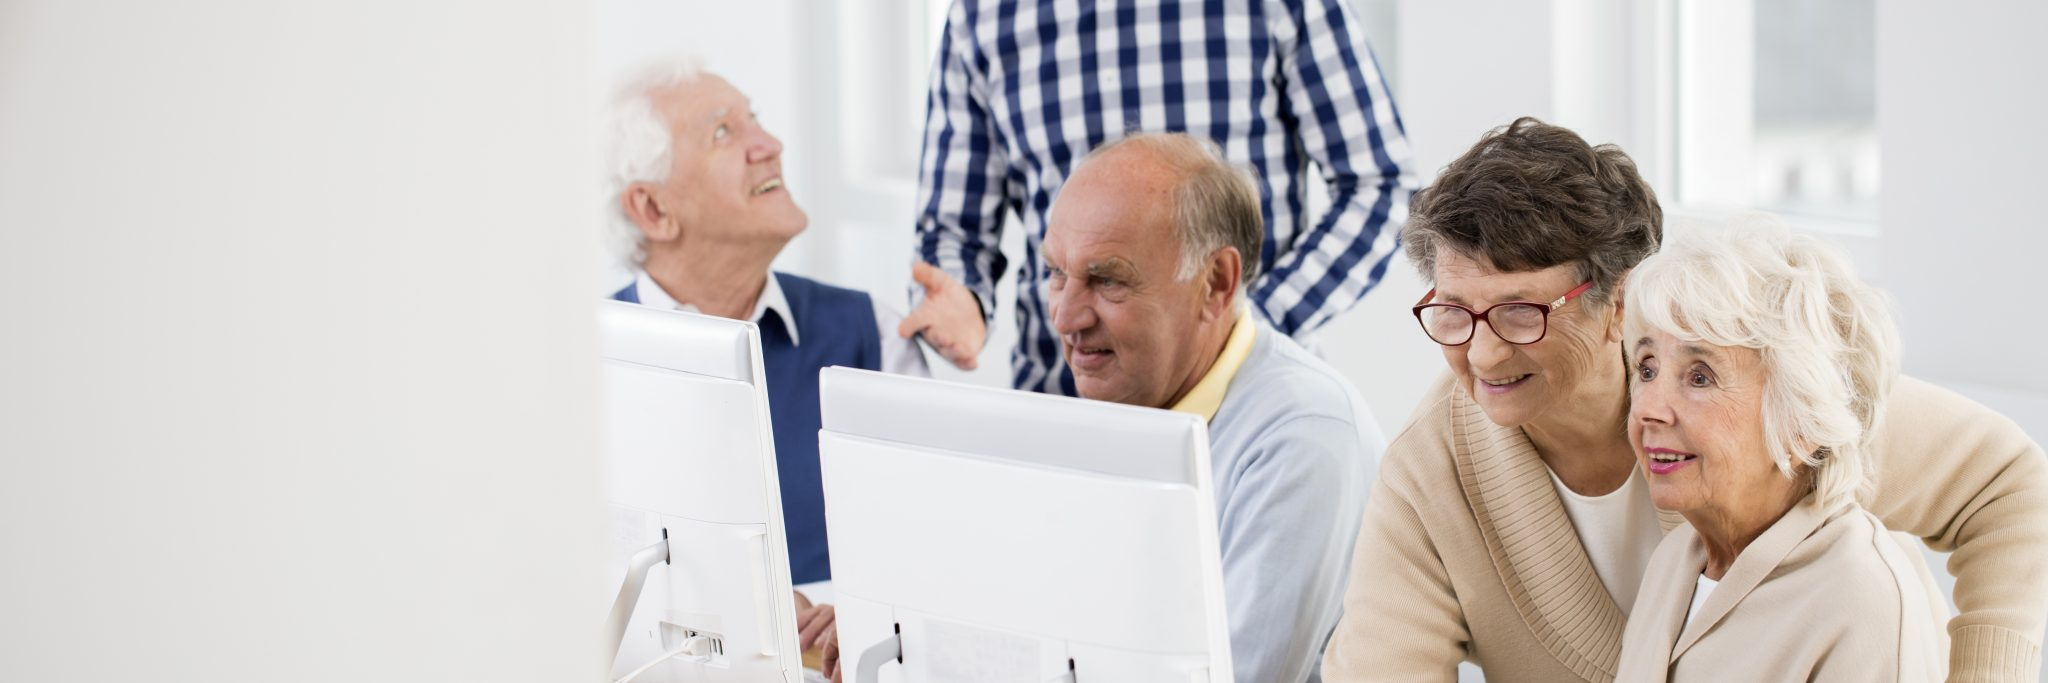 60's Years Old Senior Online Dating Website Free